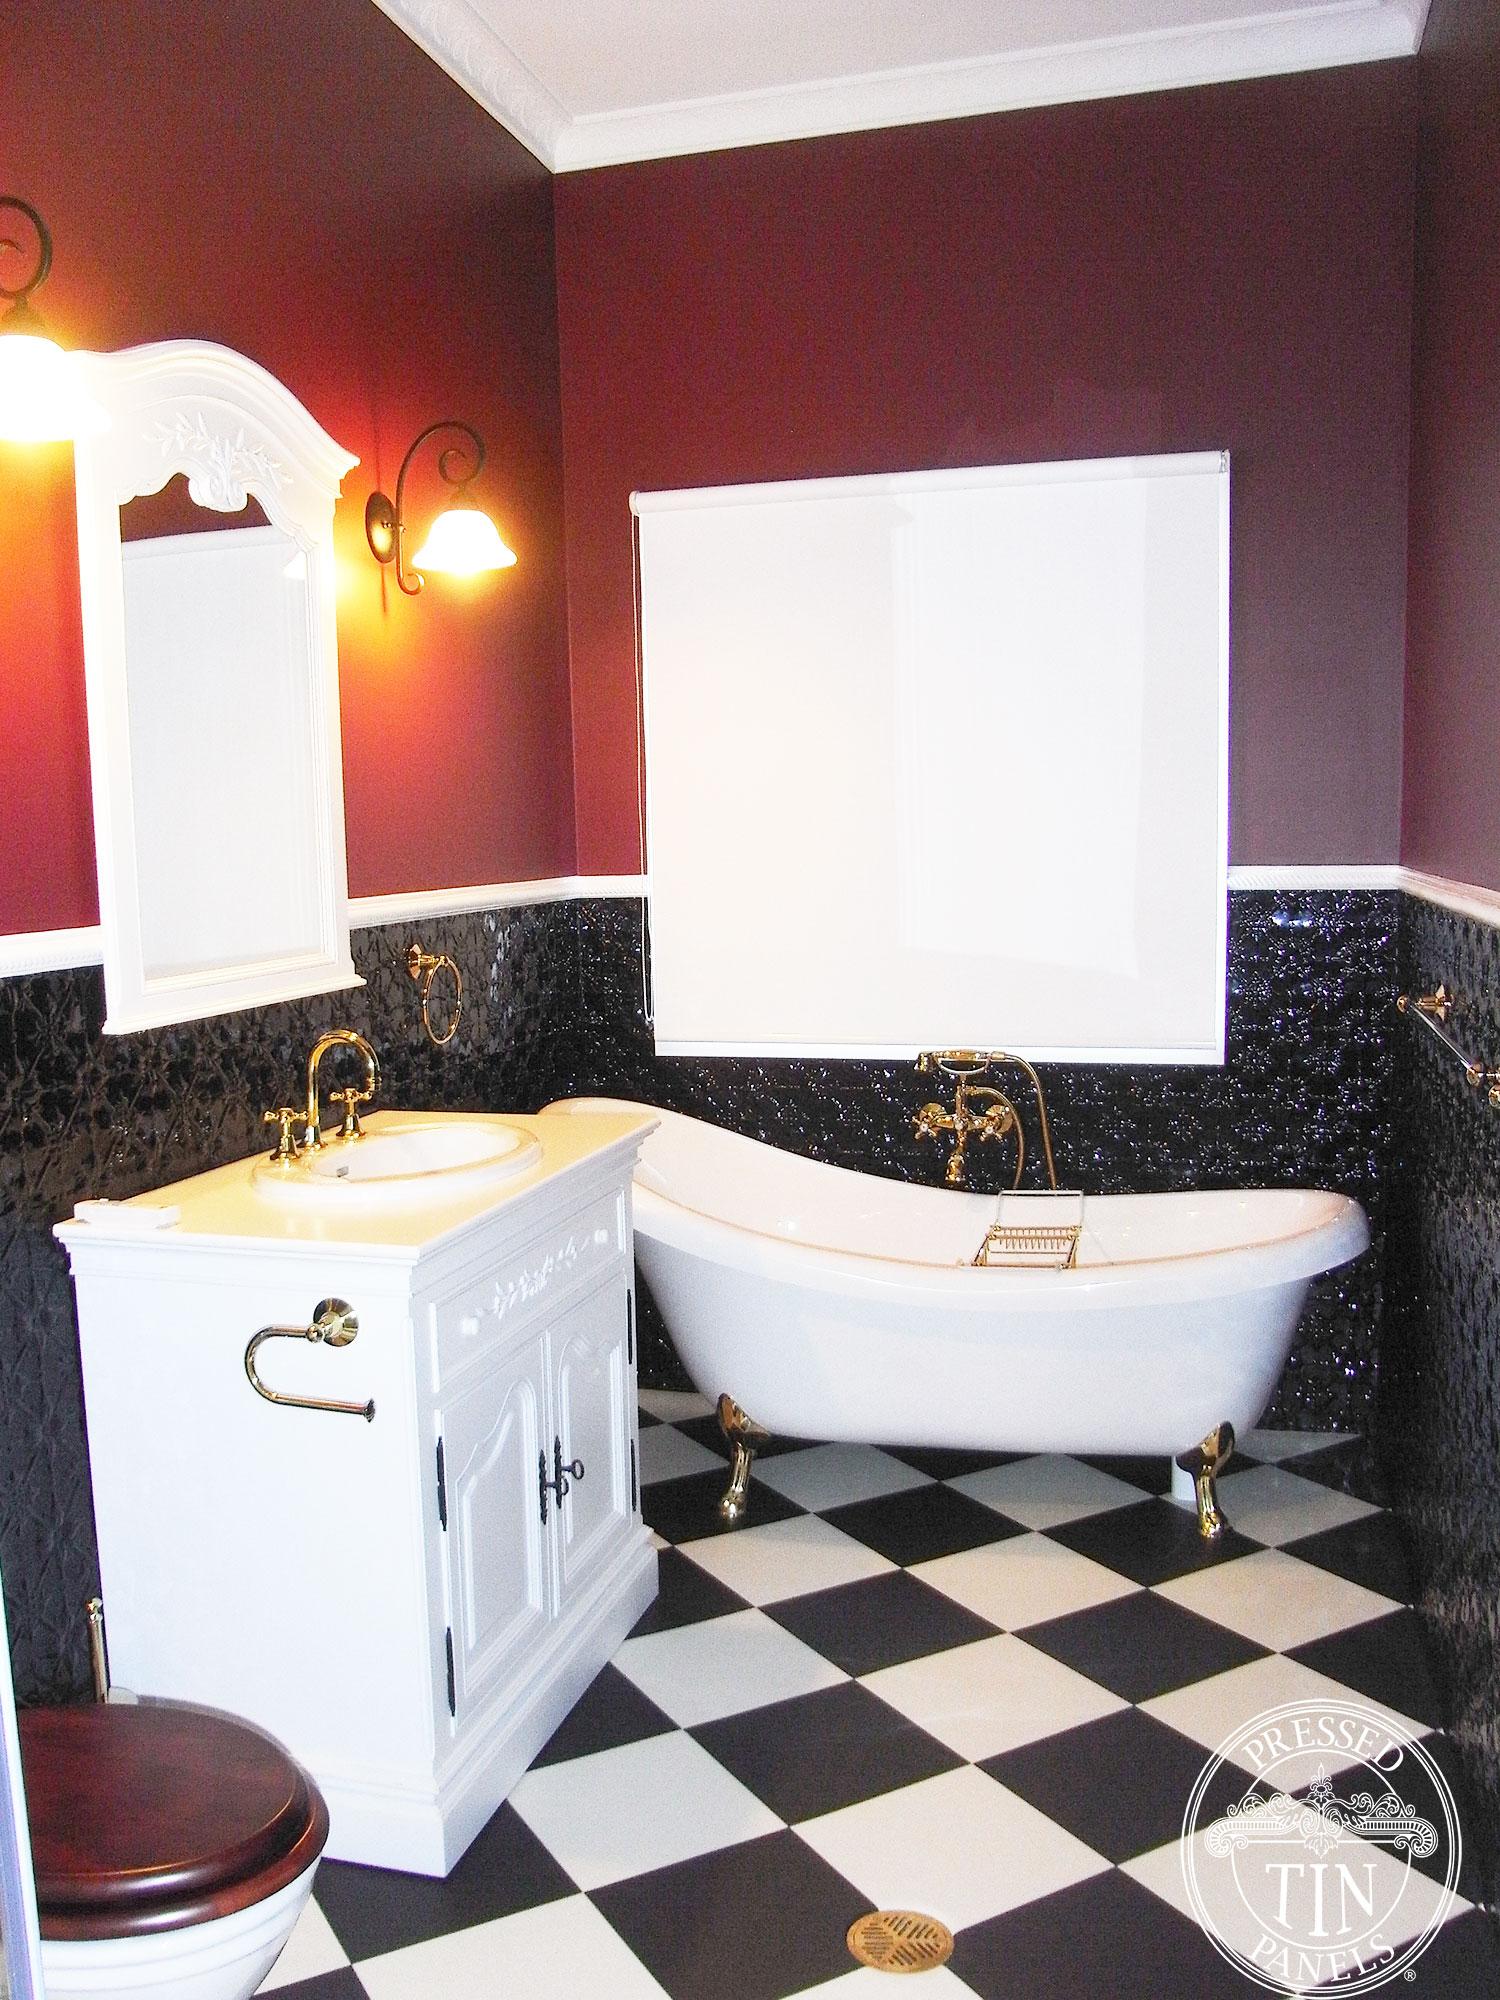 Buy Original Black Amp White Bathroom Online At Pressed